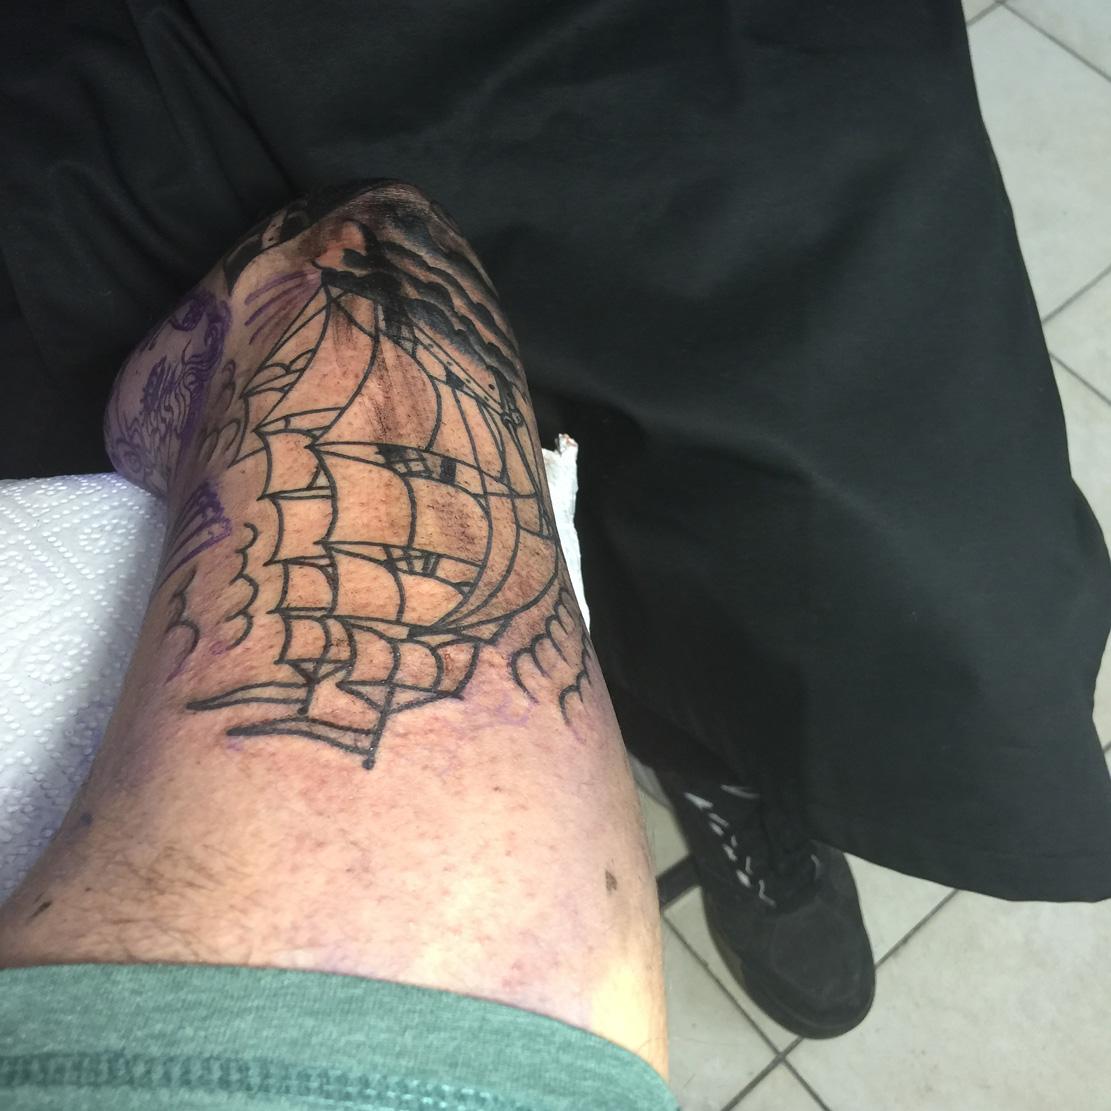 Gojenie Tatuażu Opieka Nad Tatuażem Casualism Blog Moda Męska